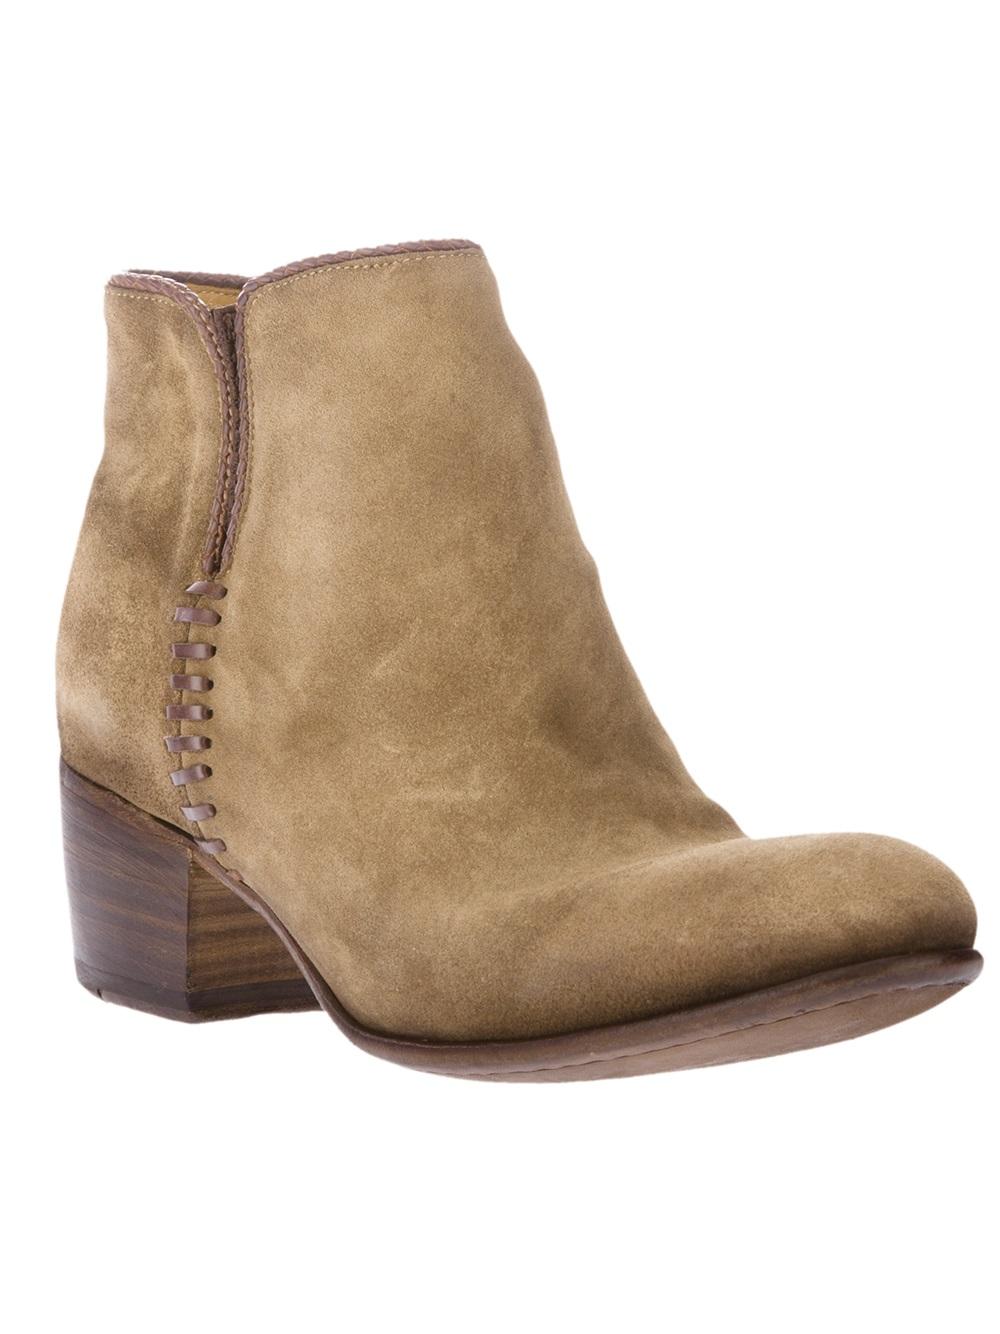 alberto fasciani mid heel ankle boot in brown lyst